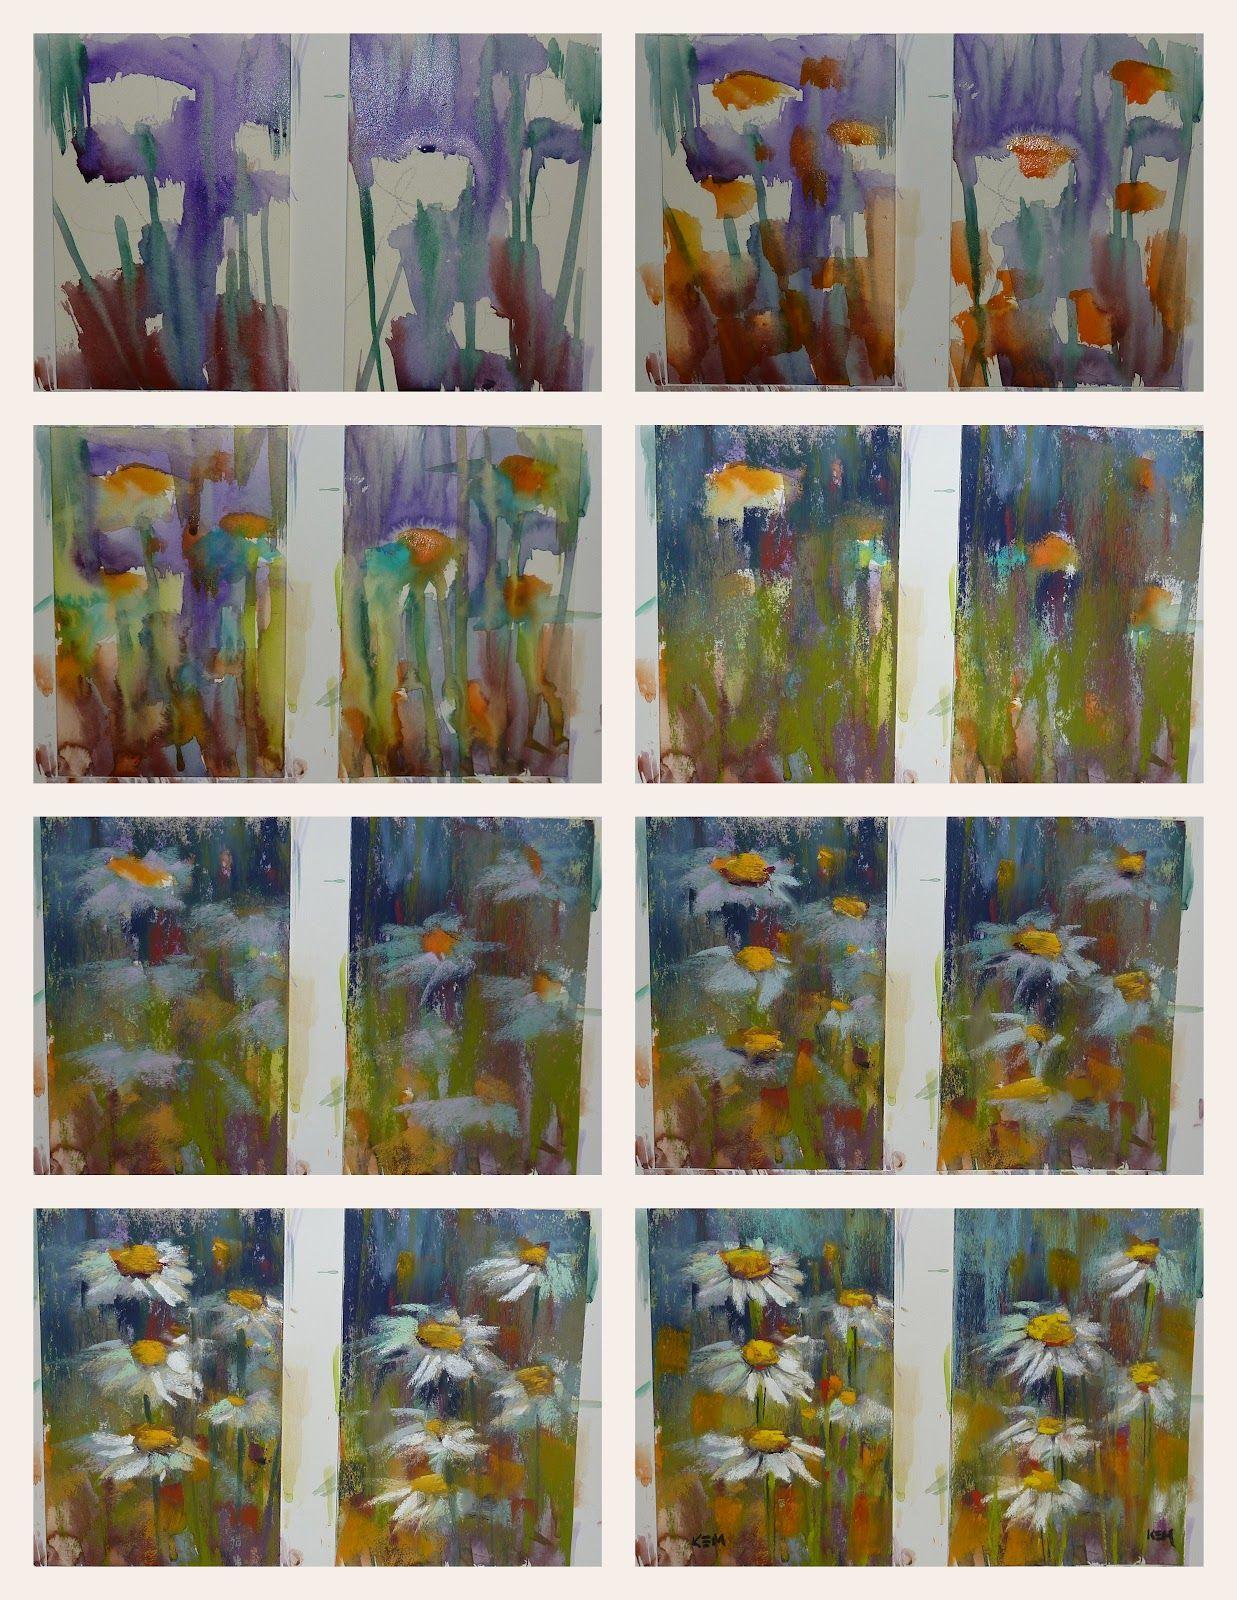 'Garden Delight I' 4x6 pastel sold     'Garden Delight II' 4x6 pastel   $40   It's Demo Monday! Today I dec...